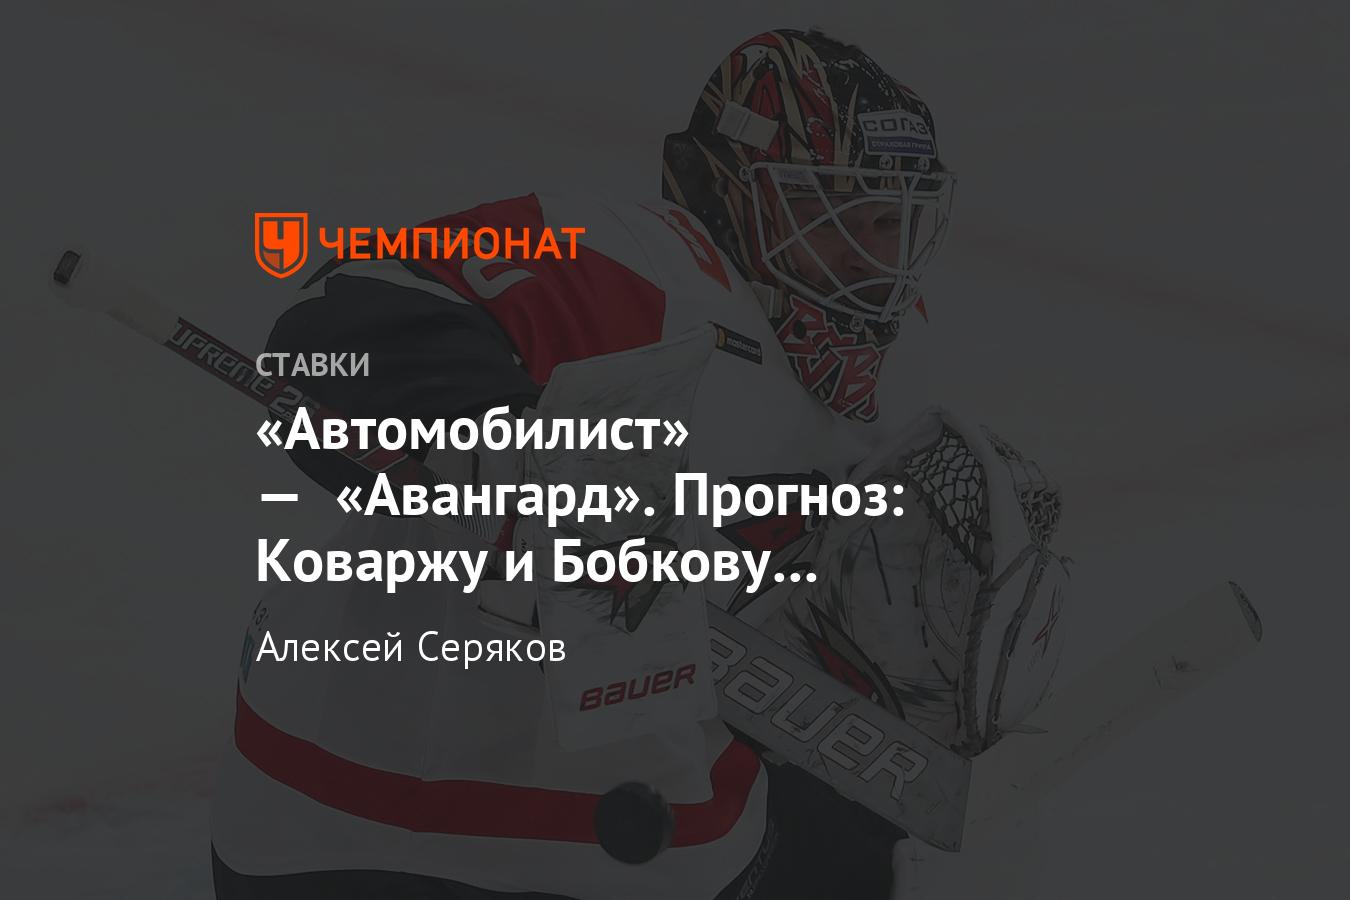 Автомобилист авангард хоккей прогноз [PUNIQRANDLINE-(au-dating-names.txt) 44